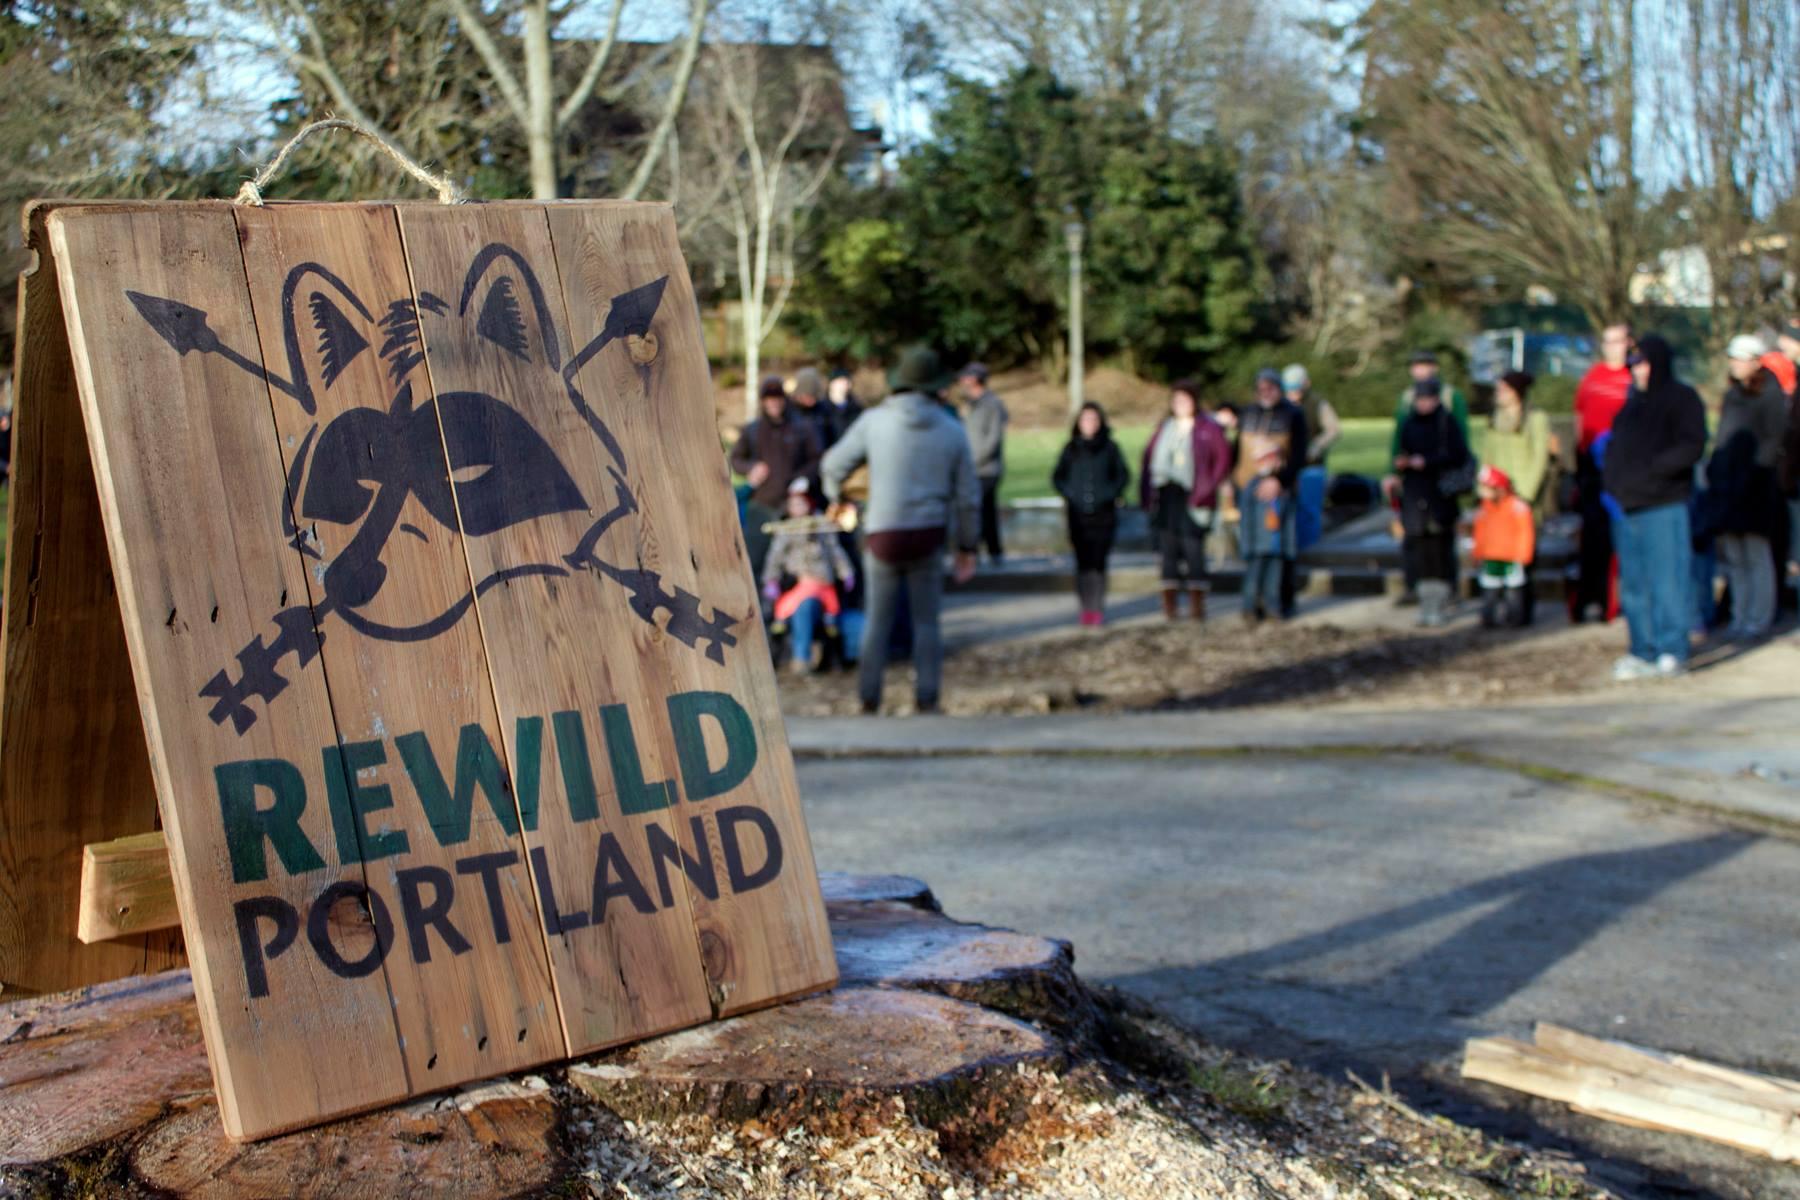 Rewildportland.jpg